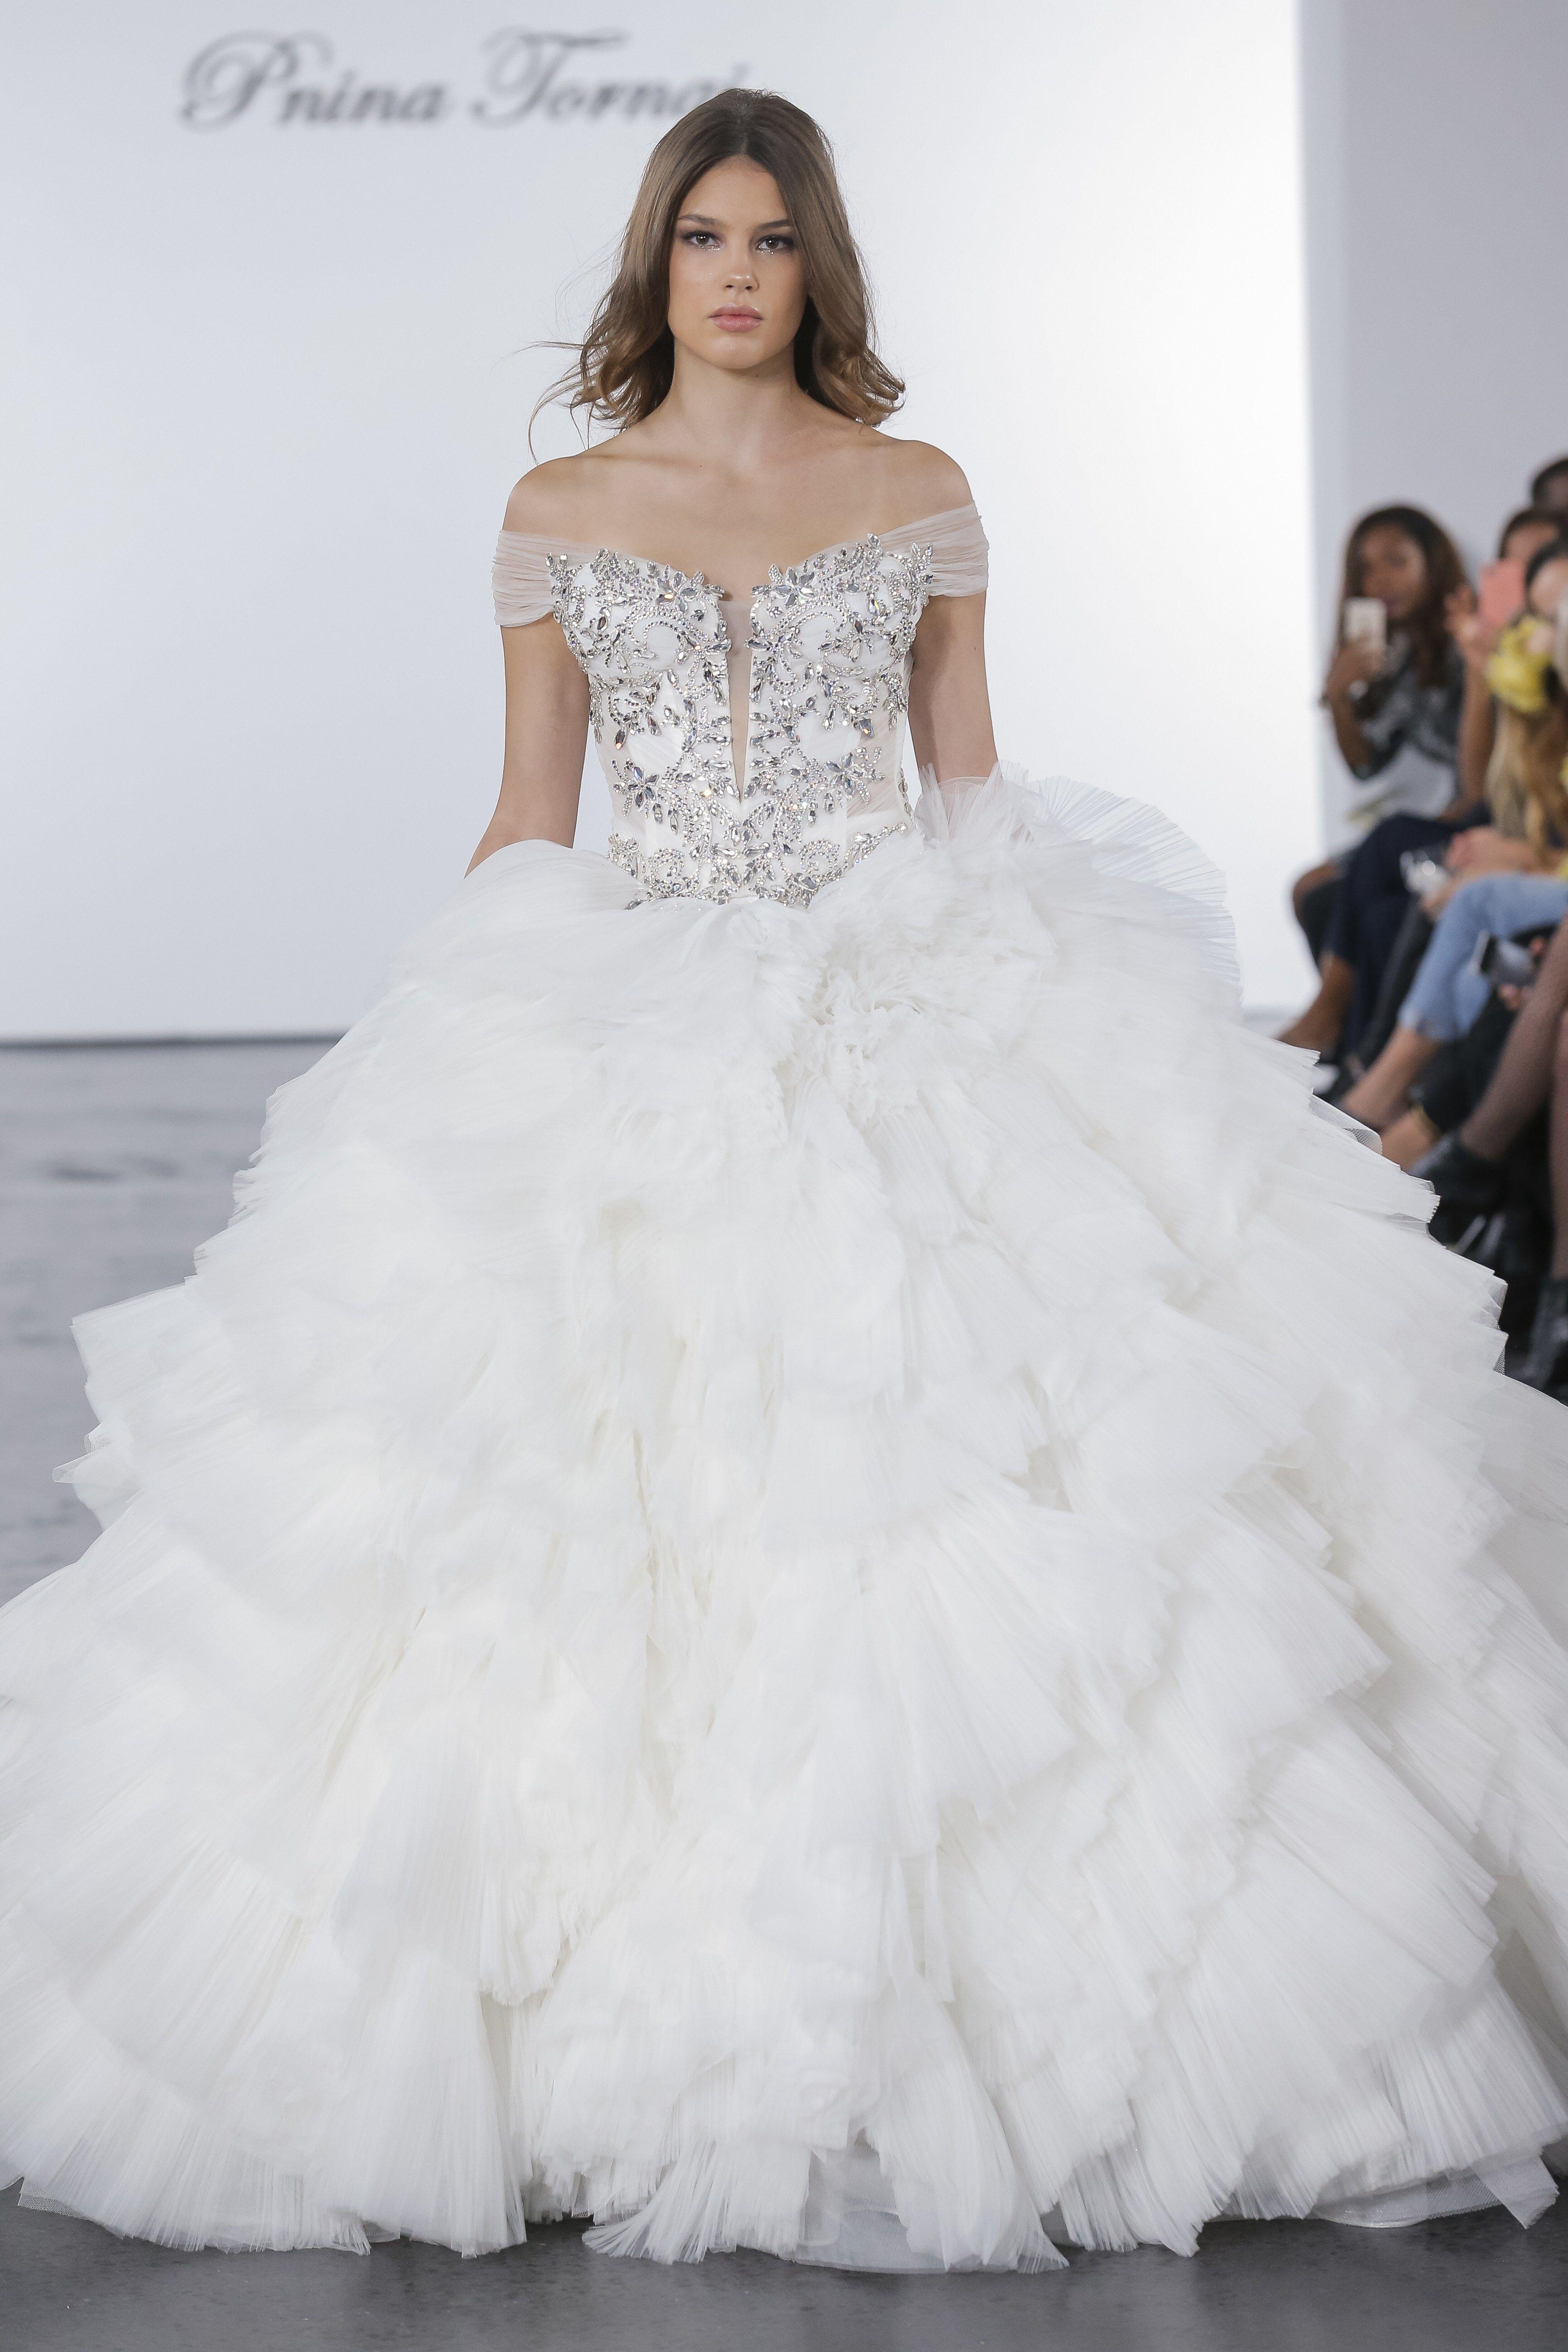 A-Line Wedding Dress   Kleinfeld Bridal   Kleinfeld Bridal Wedding Dresses